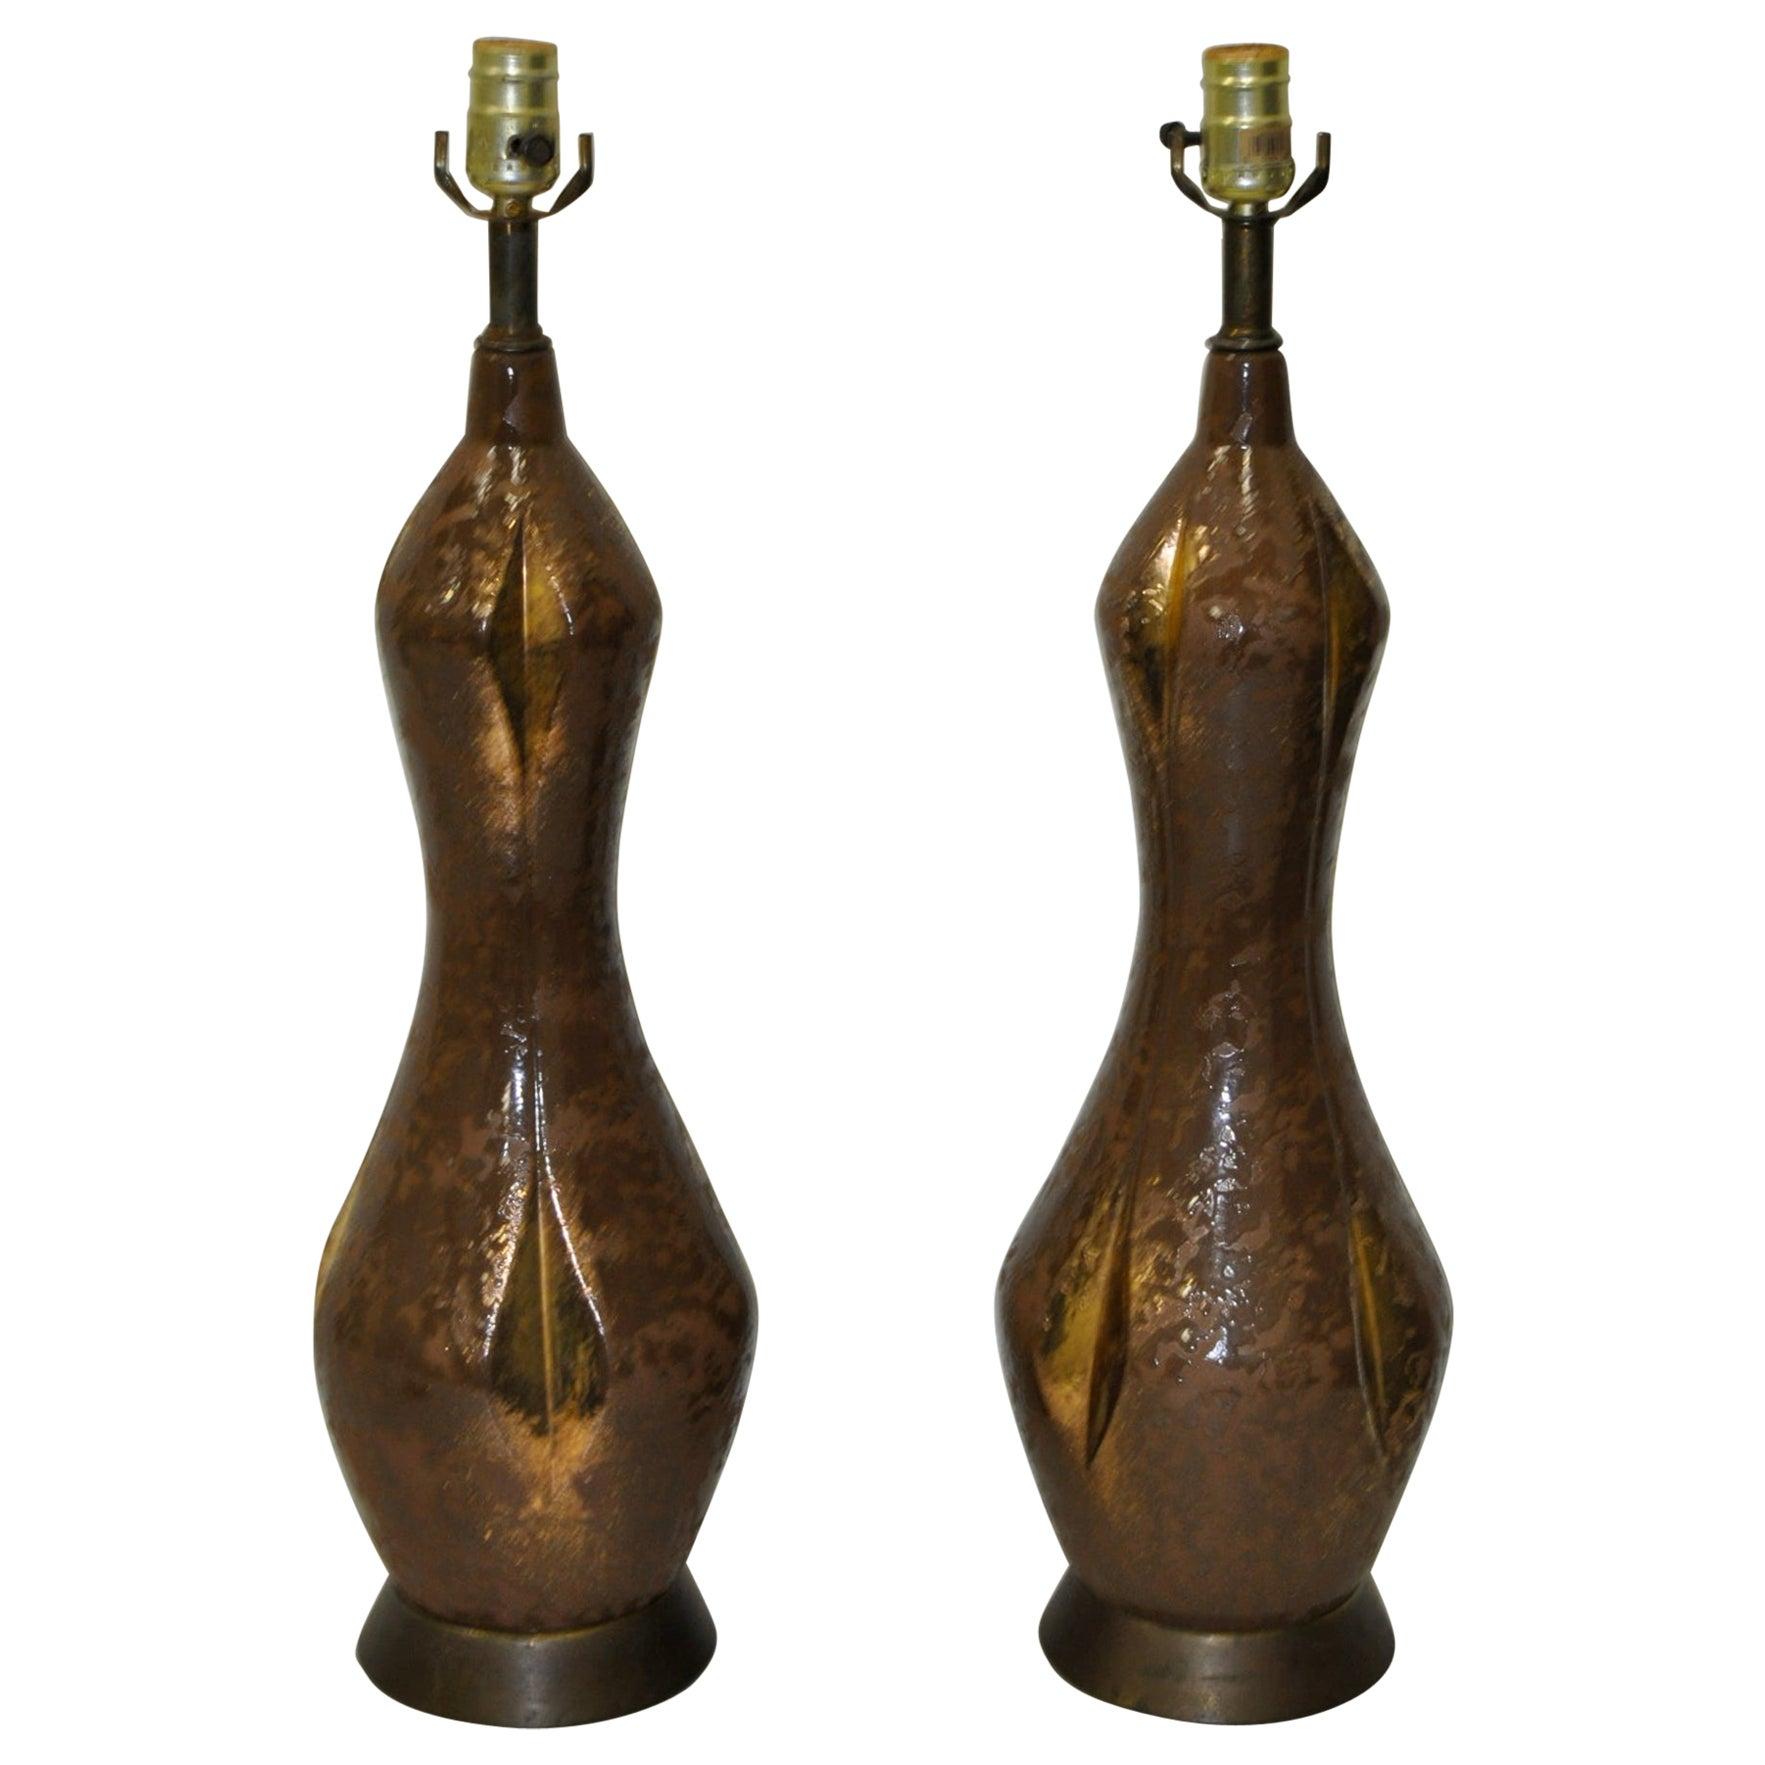 Pair of Midcentury Gilded Glaze Ceramic Table Lamps circa 1950